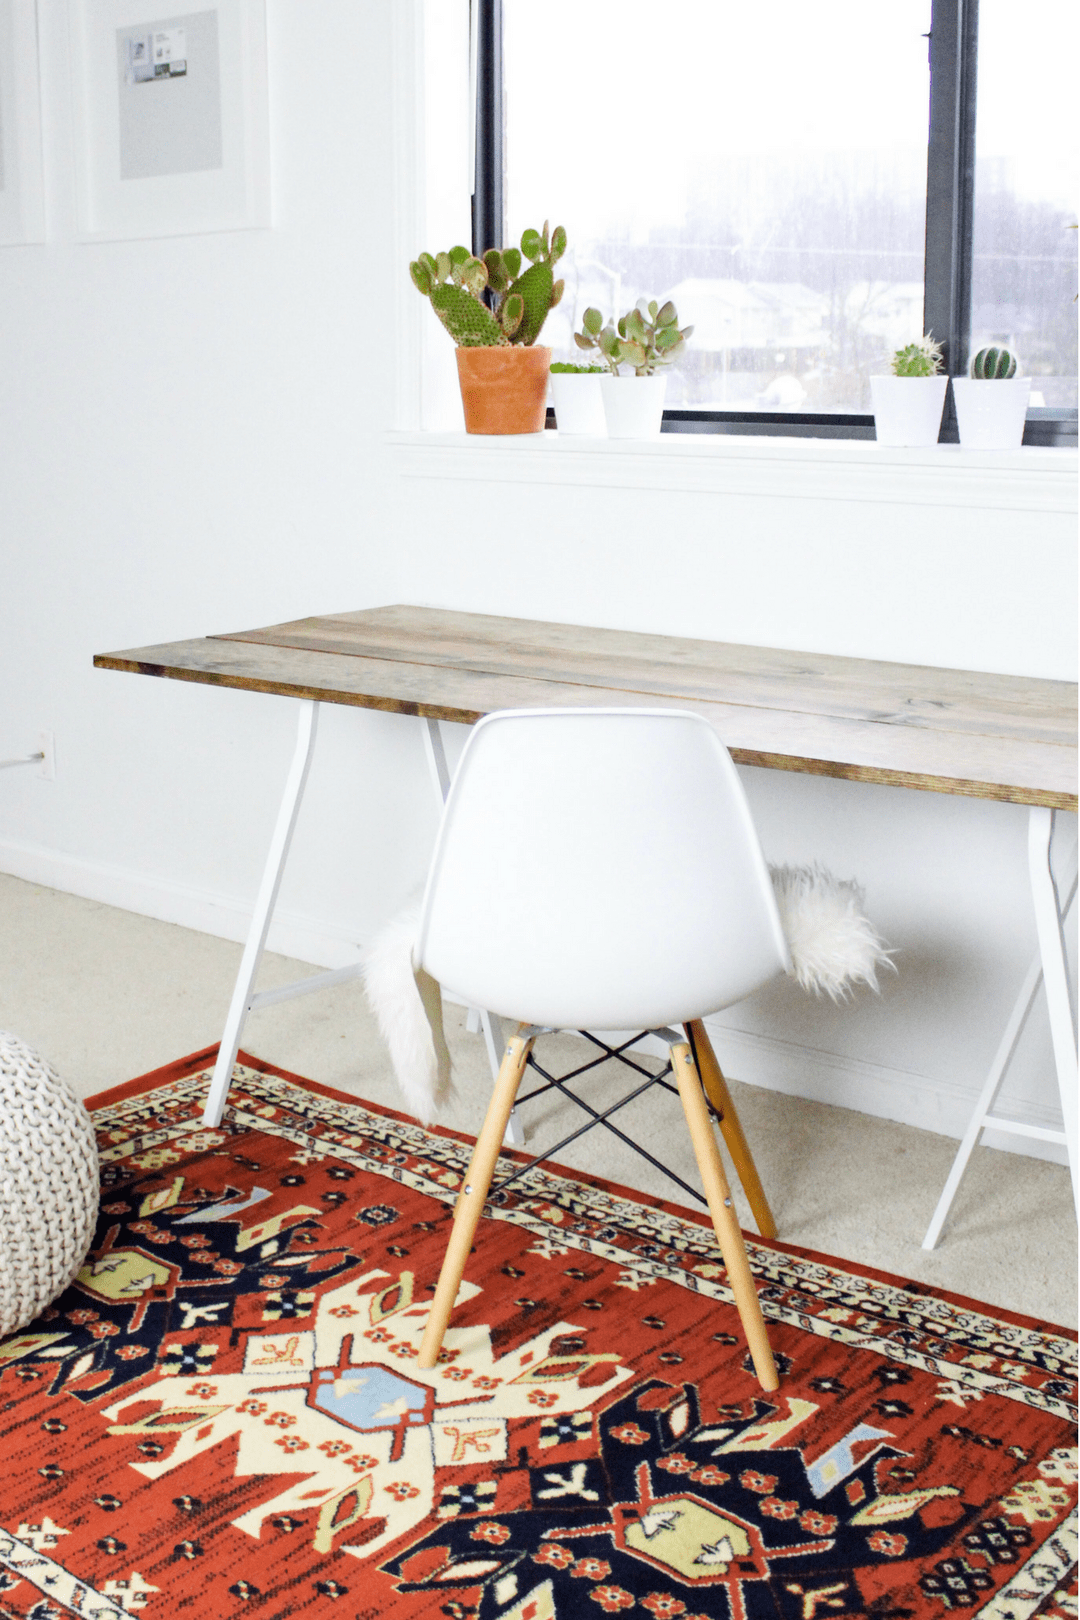 4 Step DIY Wood Desk